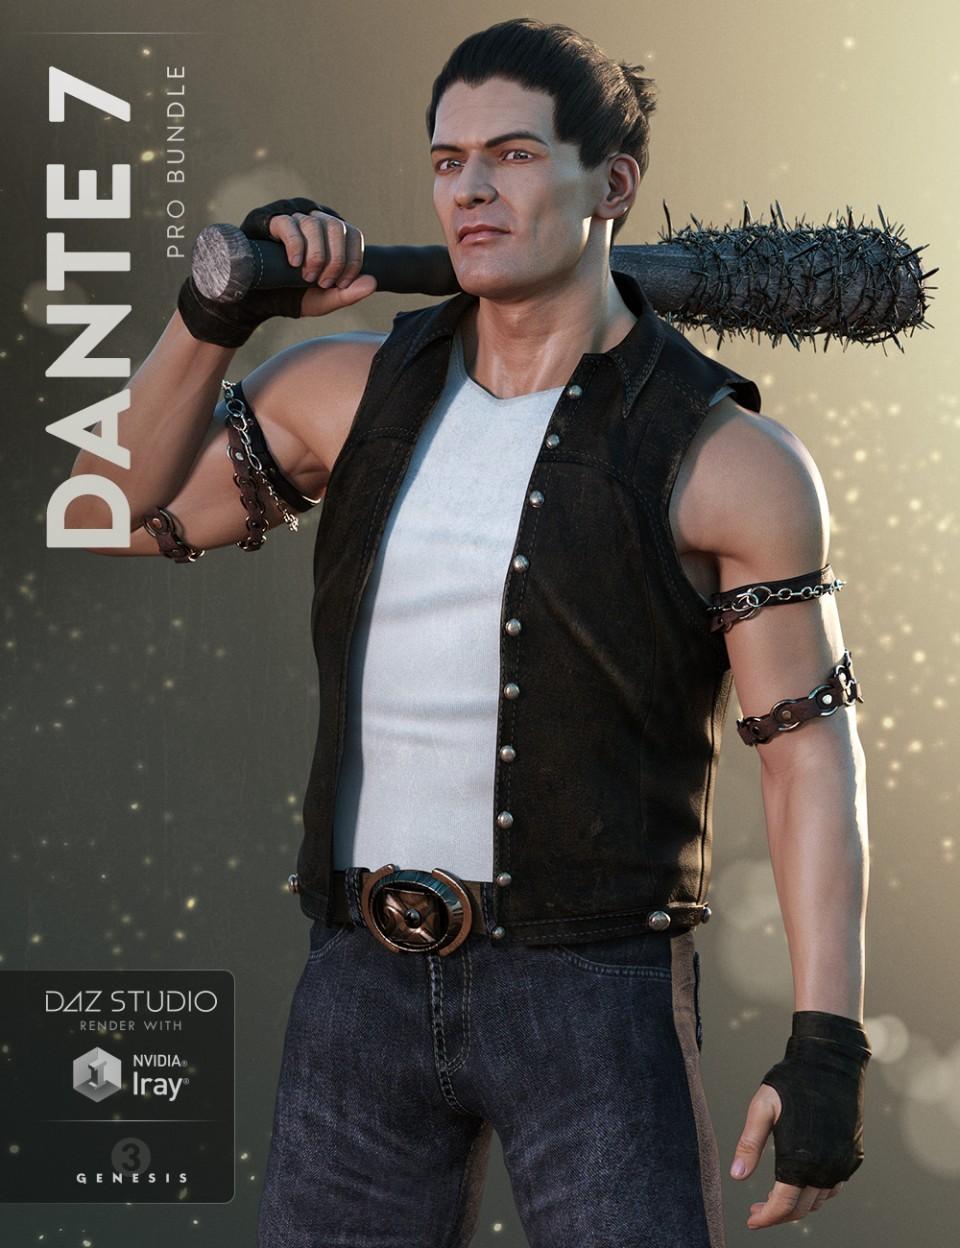 dante-7-pro-bundle